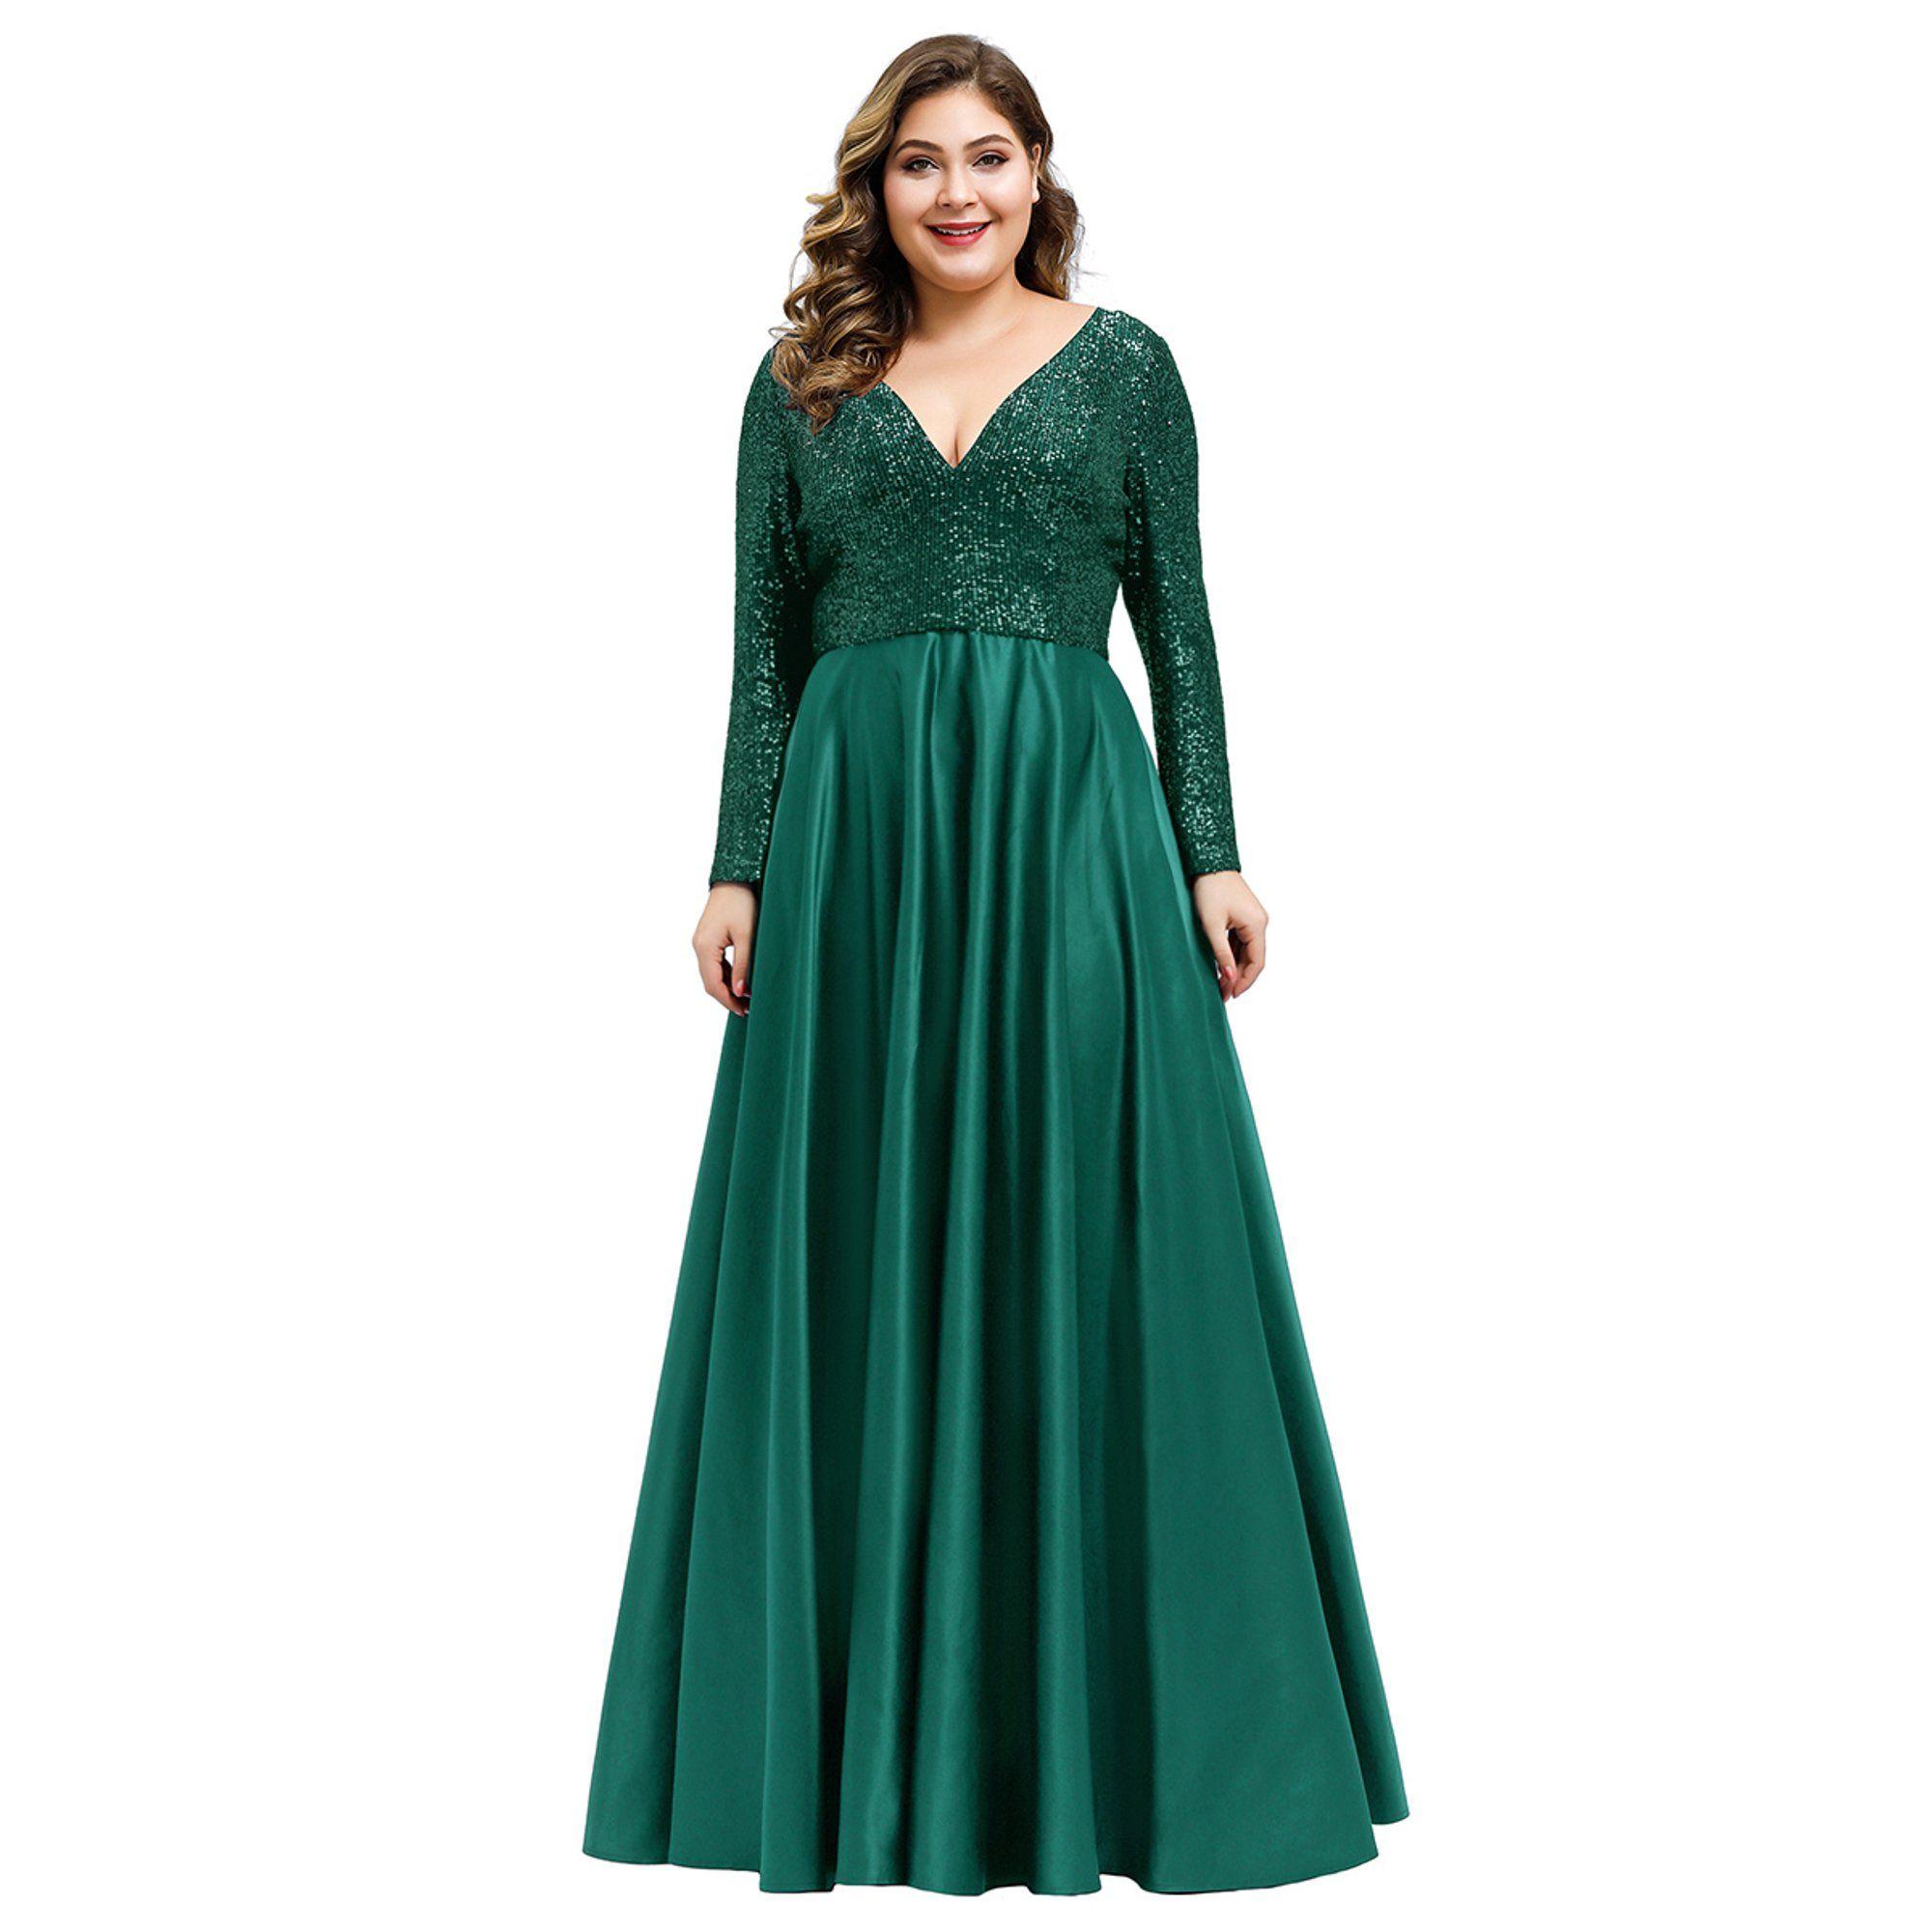 Ever Pretty Ever Pretty Women S Plus Size Formal Evening Prom Dresses For Women 00817 Us26 Walmart Com In 2021 Plus Size Evening Gown Maxi Dress Prom Dresses Formal Elegant [ 2000 x 2000 Pixel ]